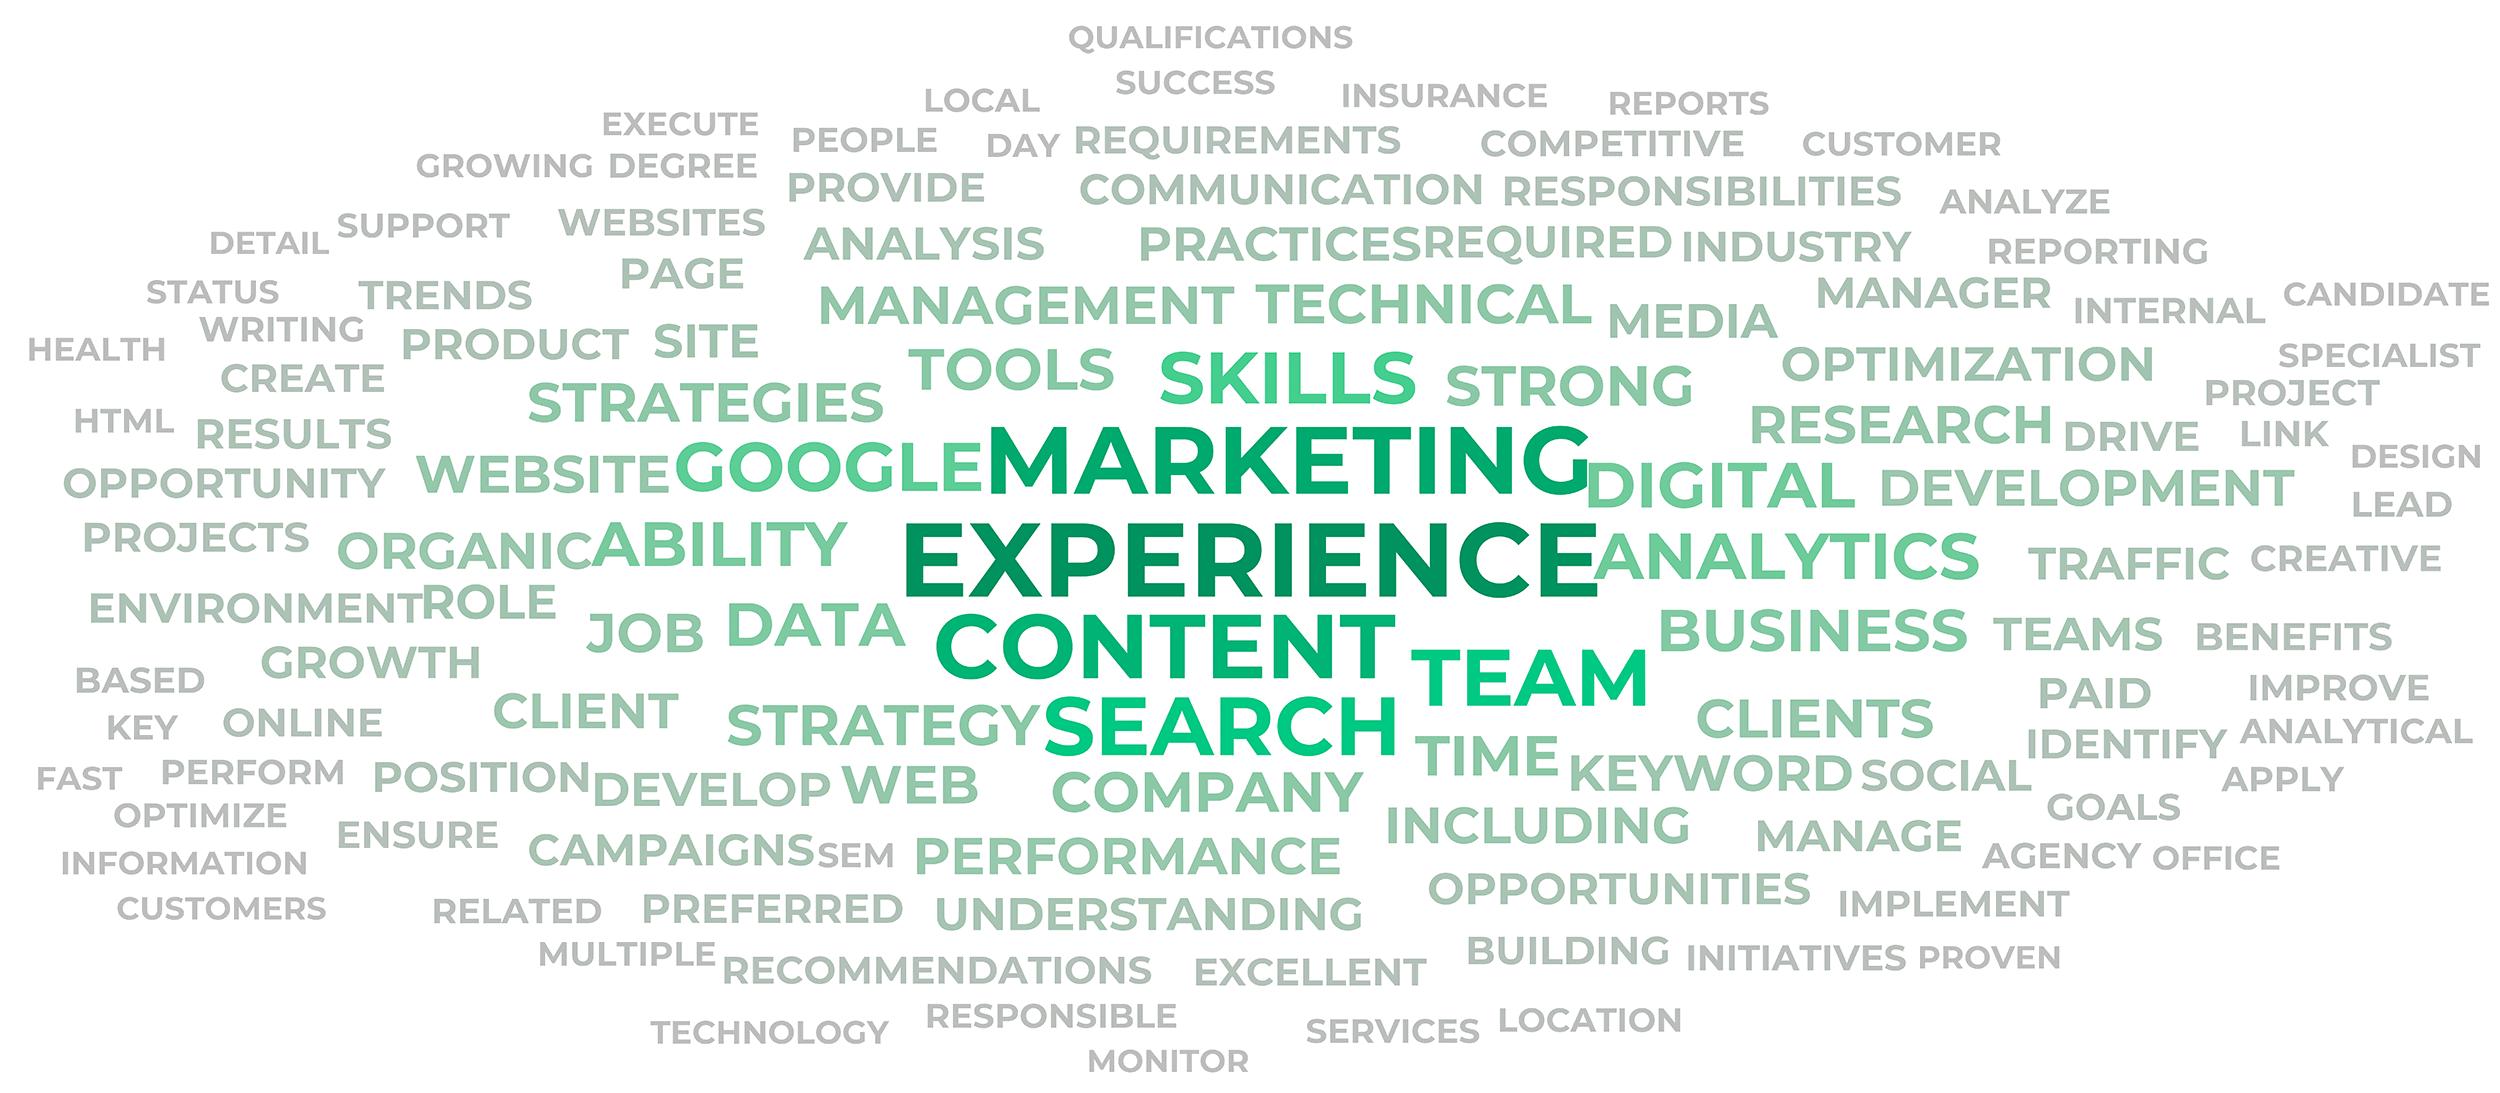 Job description terms – Word cloud